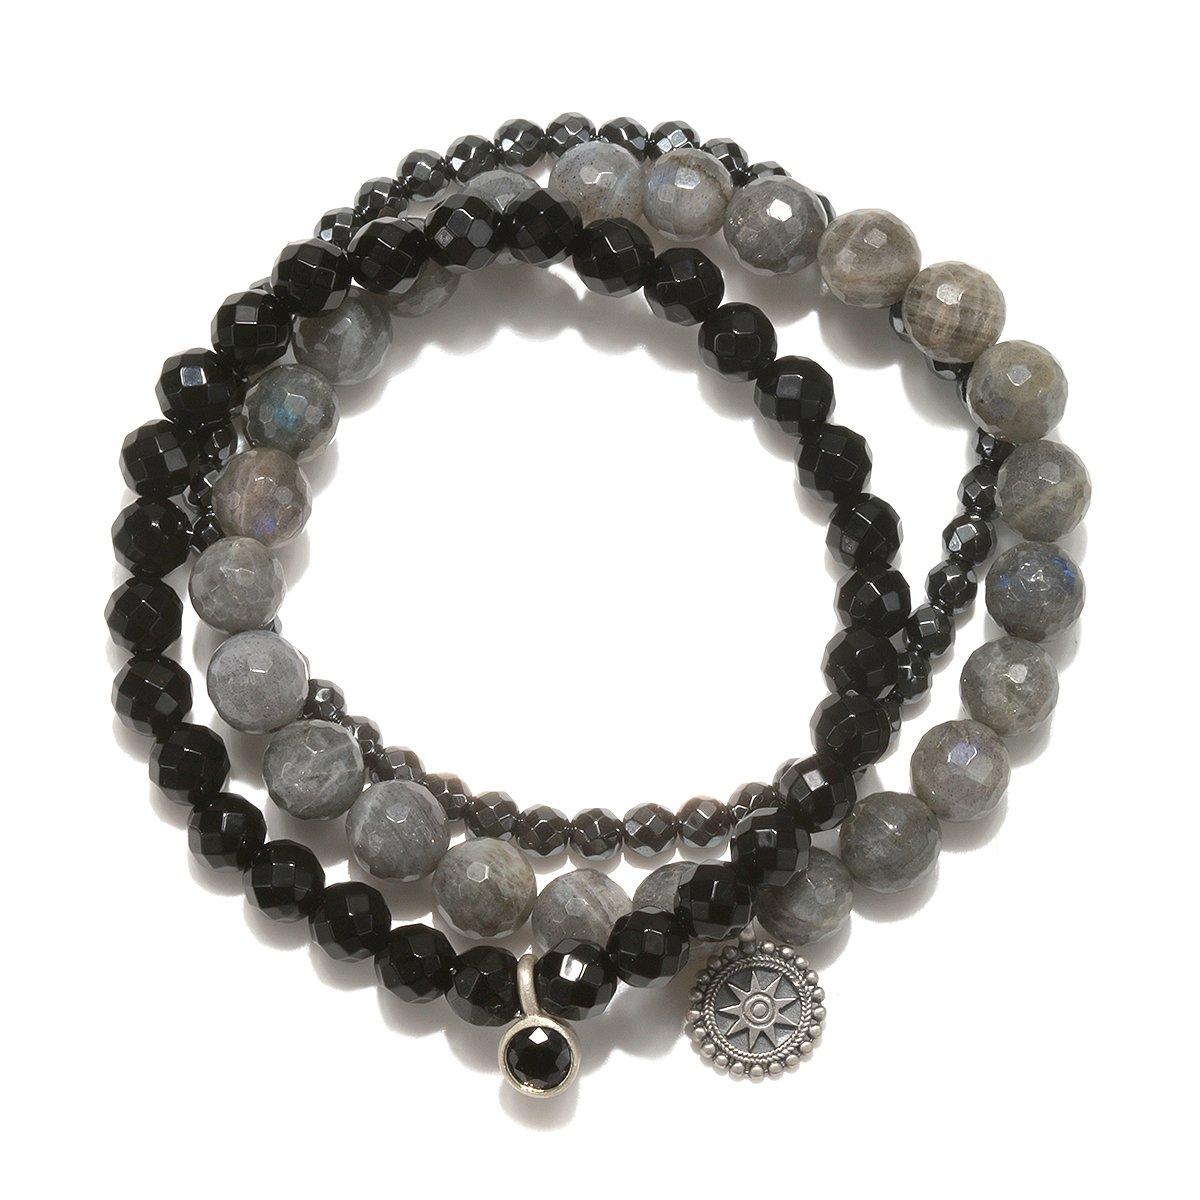 Satya Jewelry Labradorite, Black Onyx, Hematite Sterling Silver Mandala Stretch Bracelet by Satya Jewelry